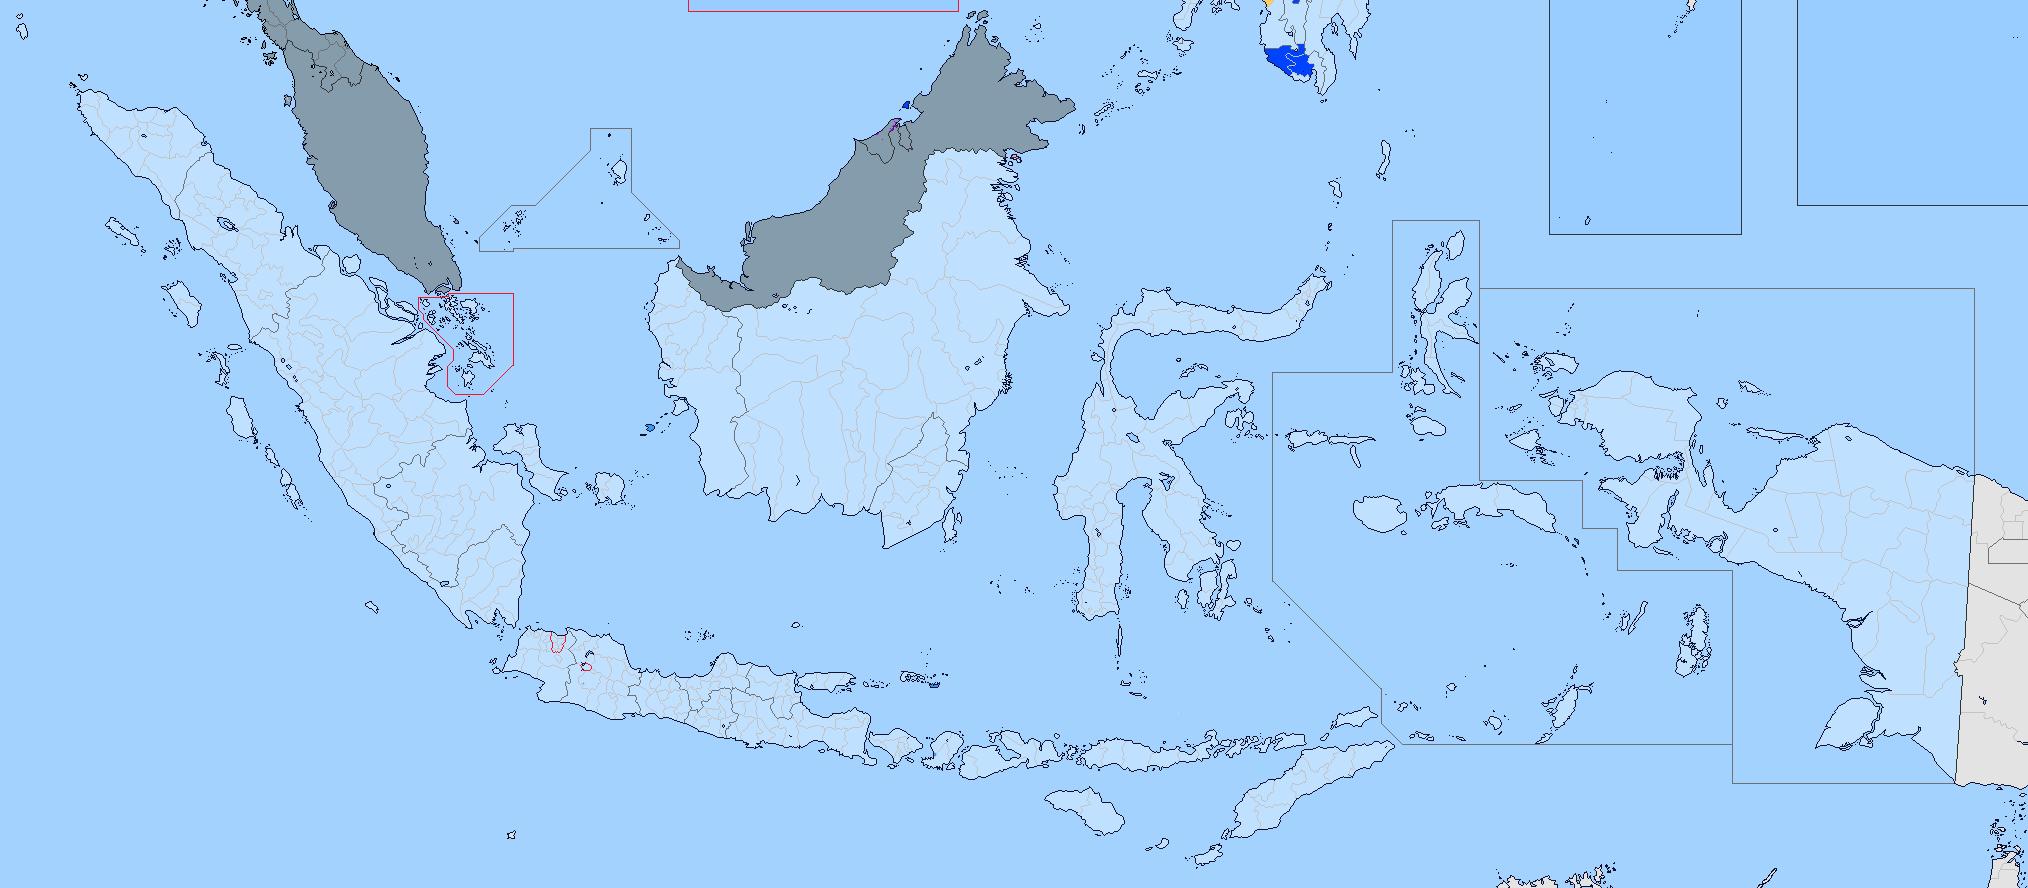 indonesiapre1955map.png